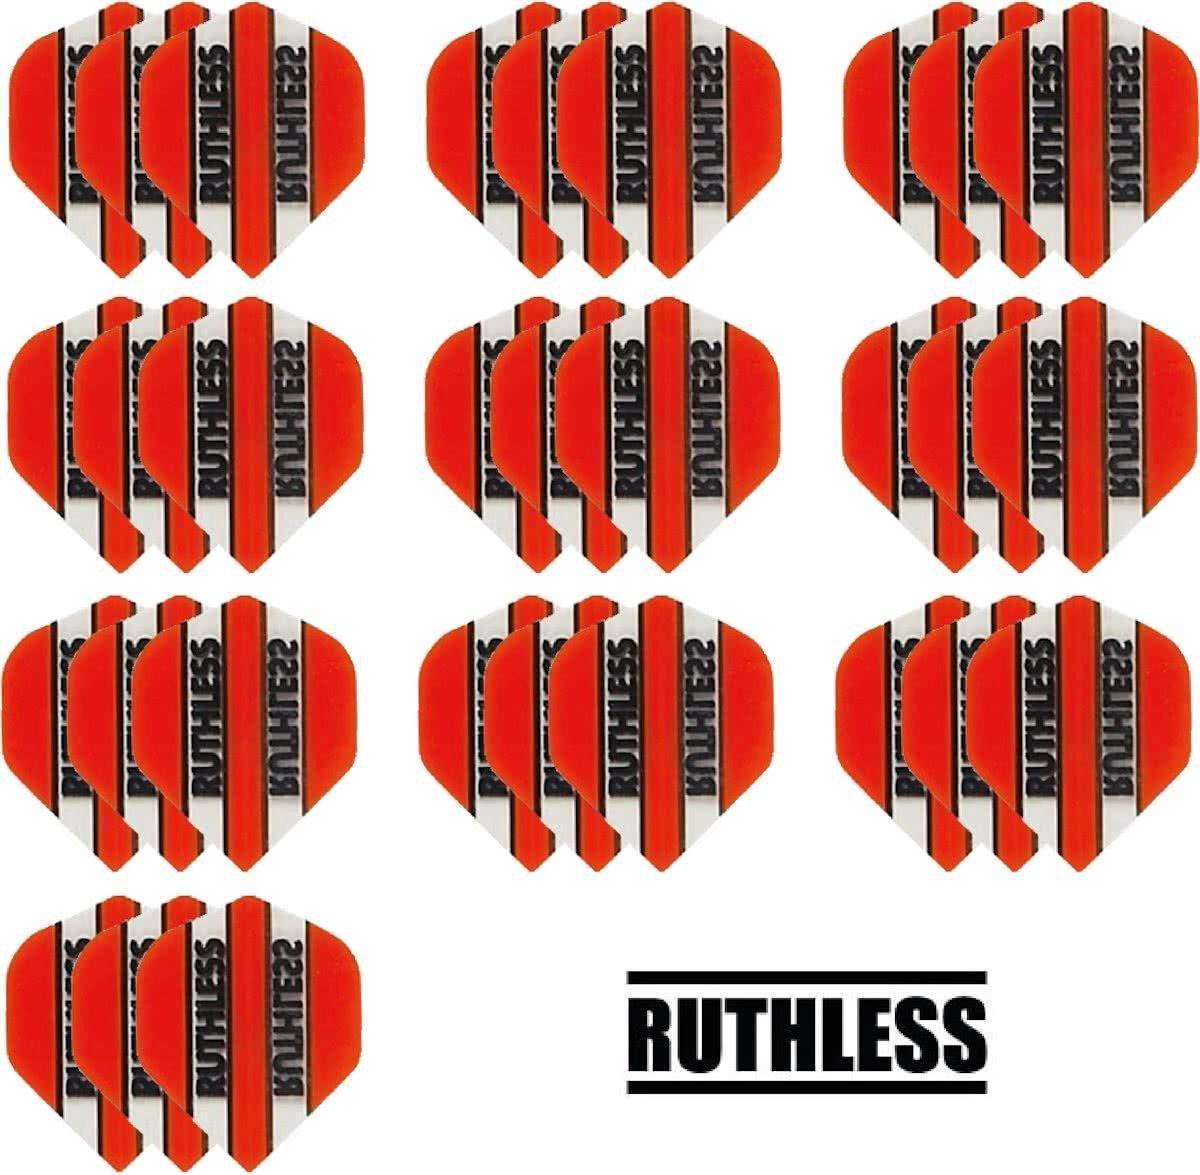 Dragon darts - 10 Sets (30 stuks) - Ruthless - sterke flights - Oranje - darts flights